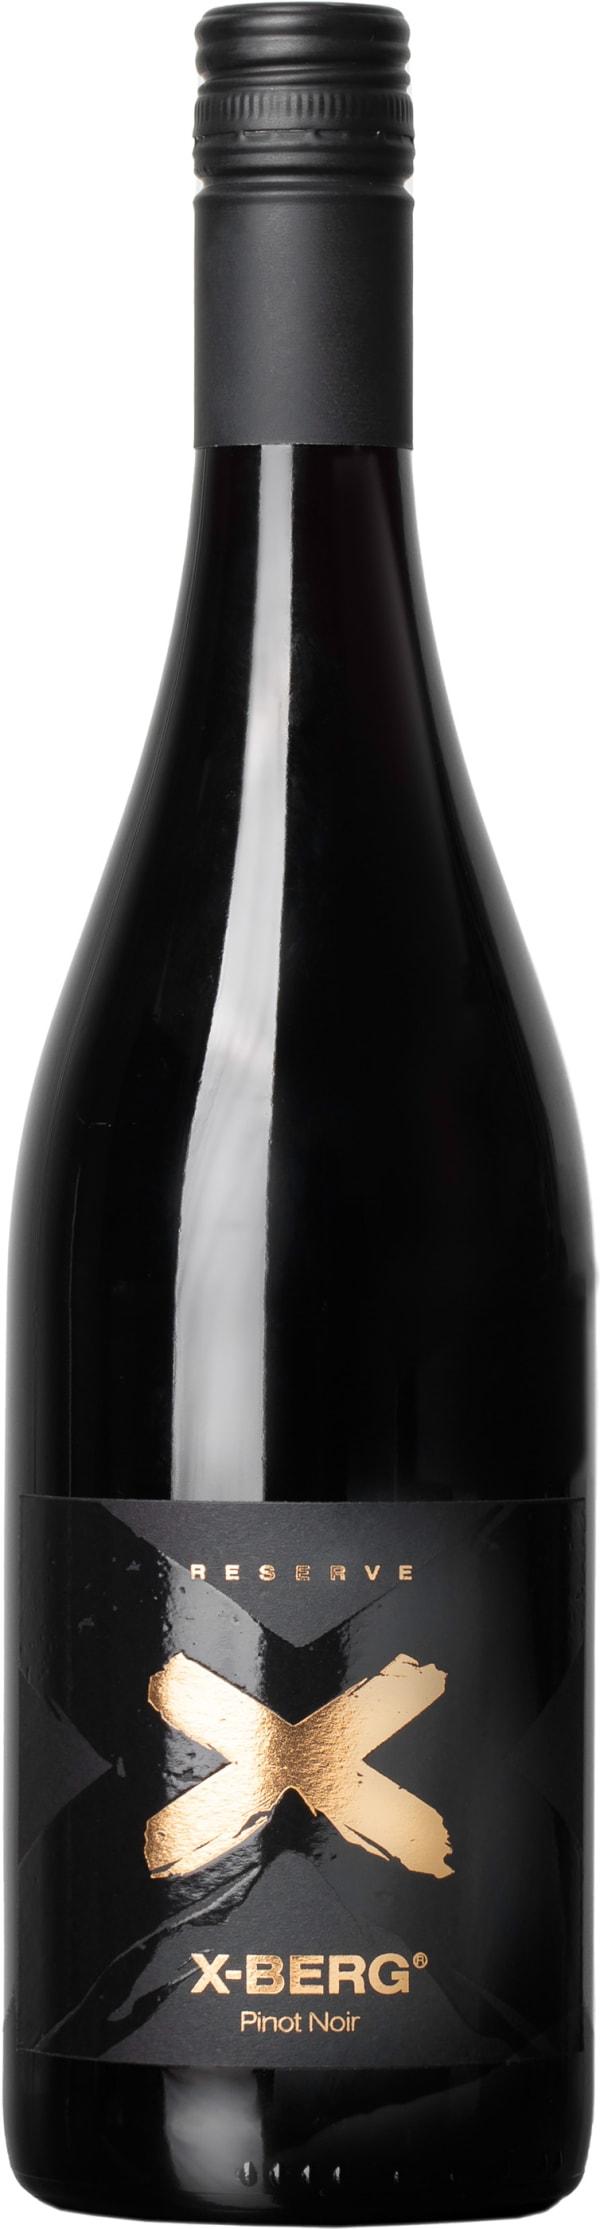 X-Berg Pinot Noir 2015